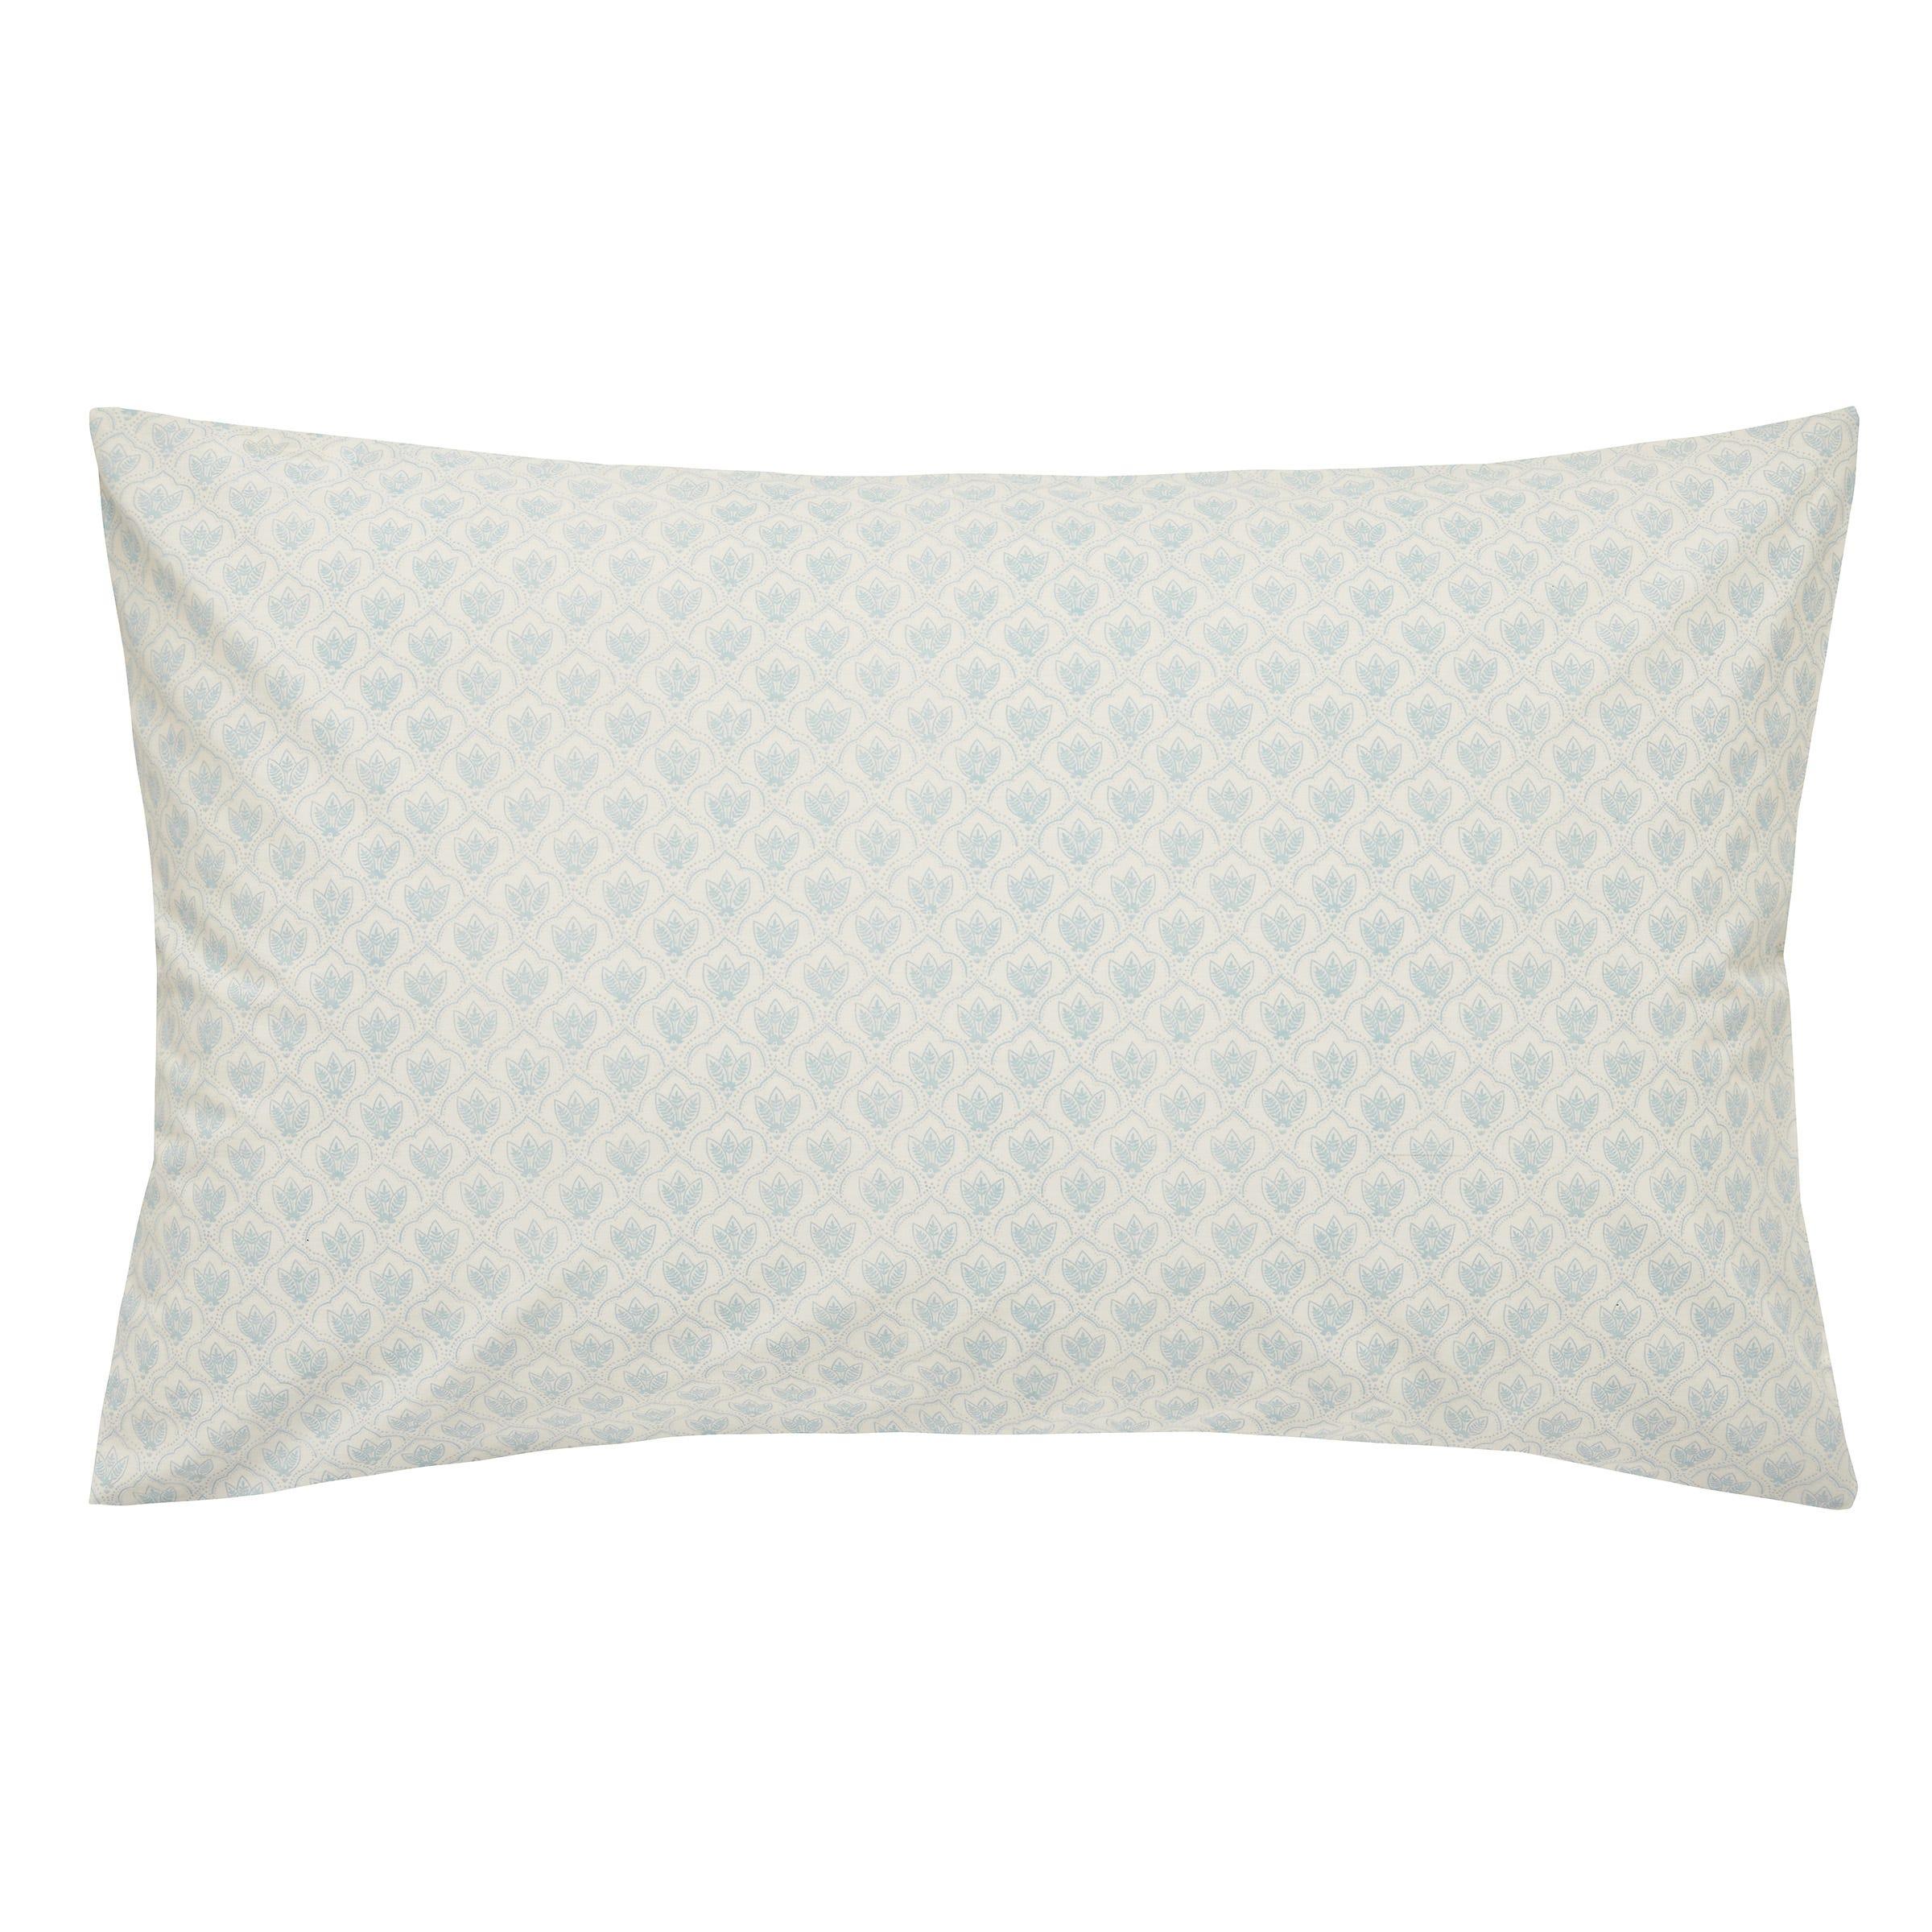 Sanderson Bedding Sita Housewife Pillowcase JadeCobalt